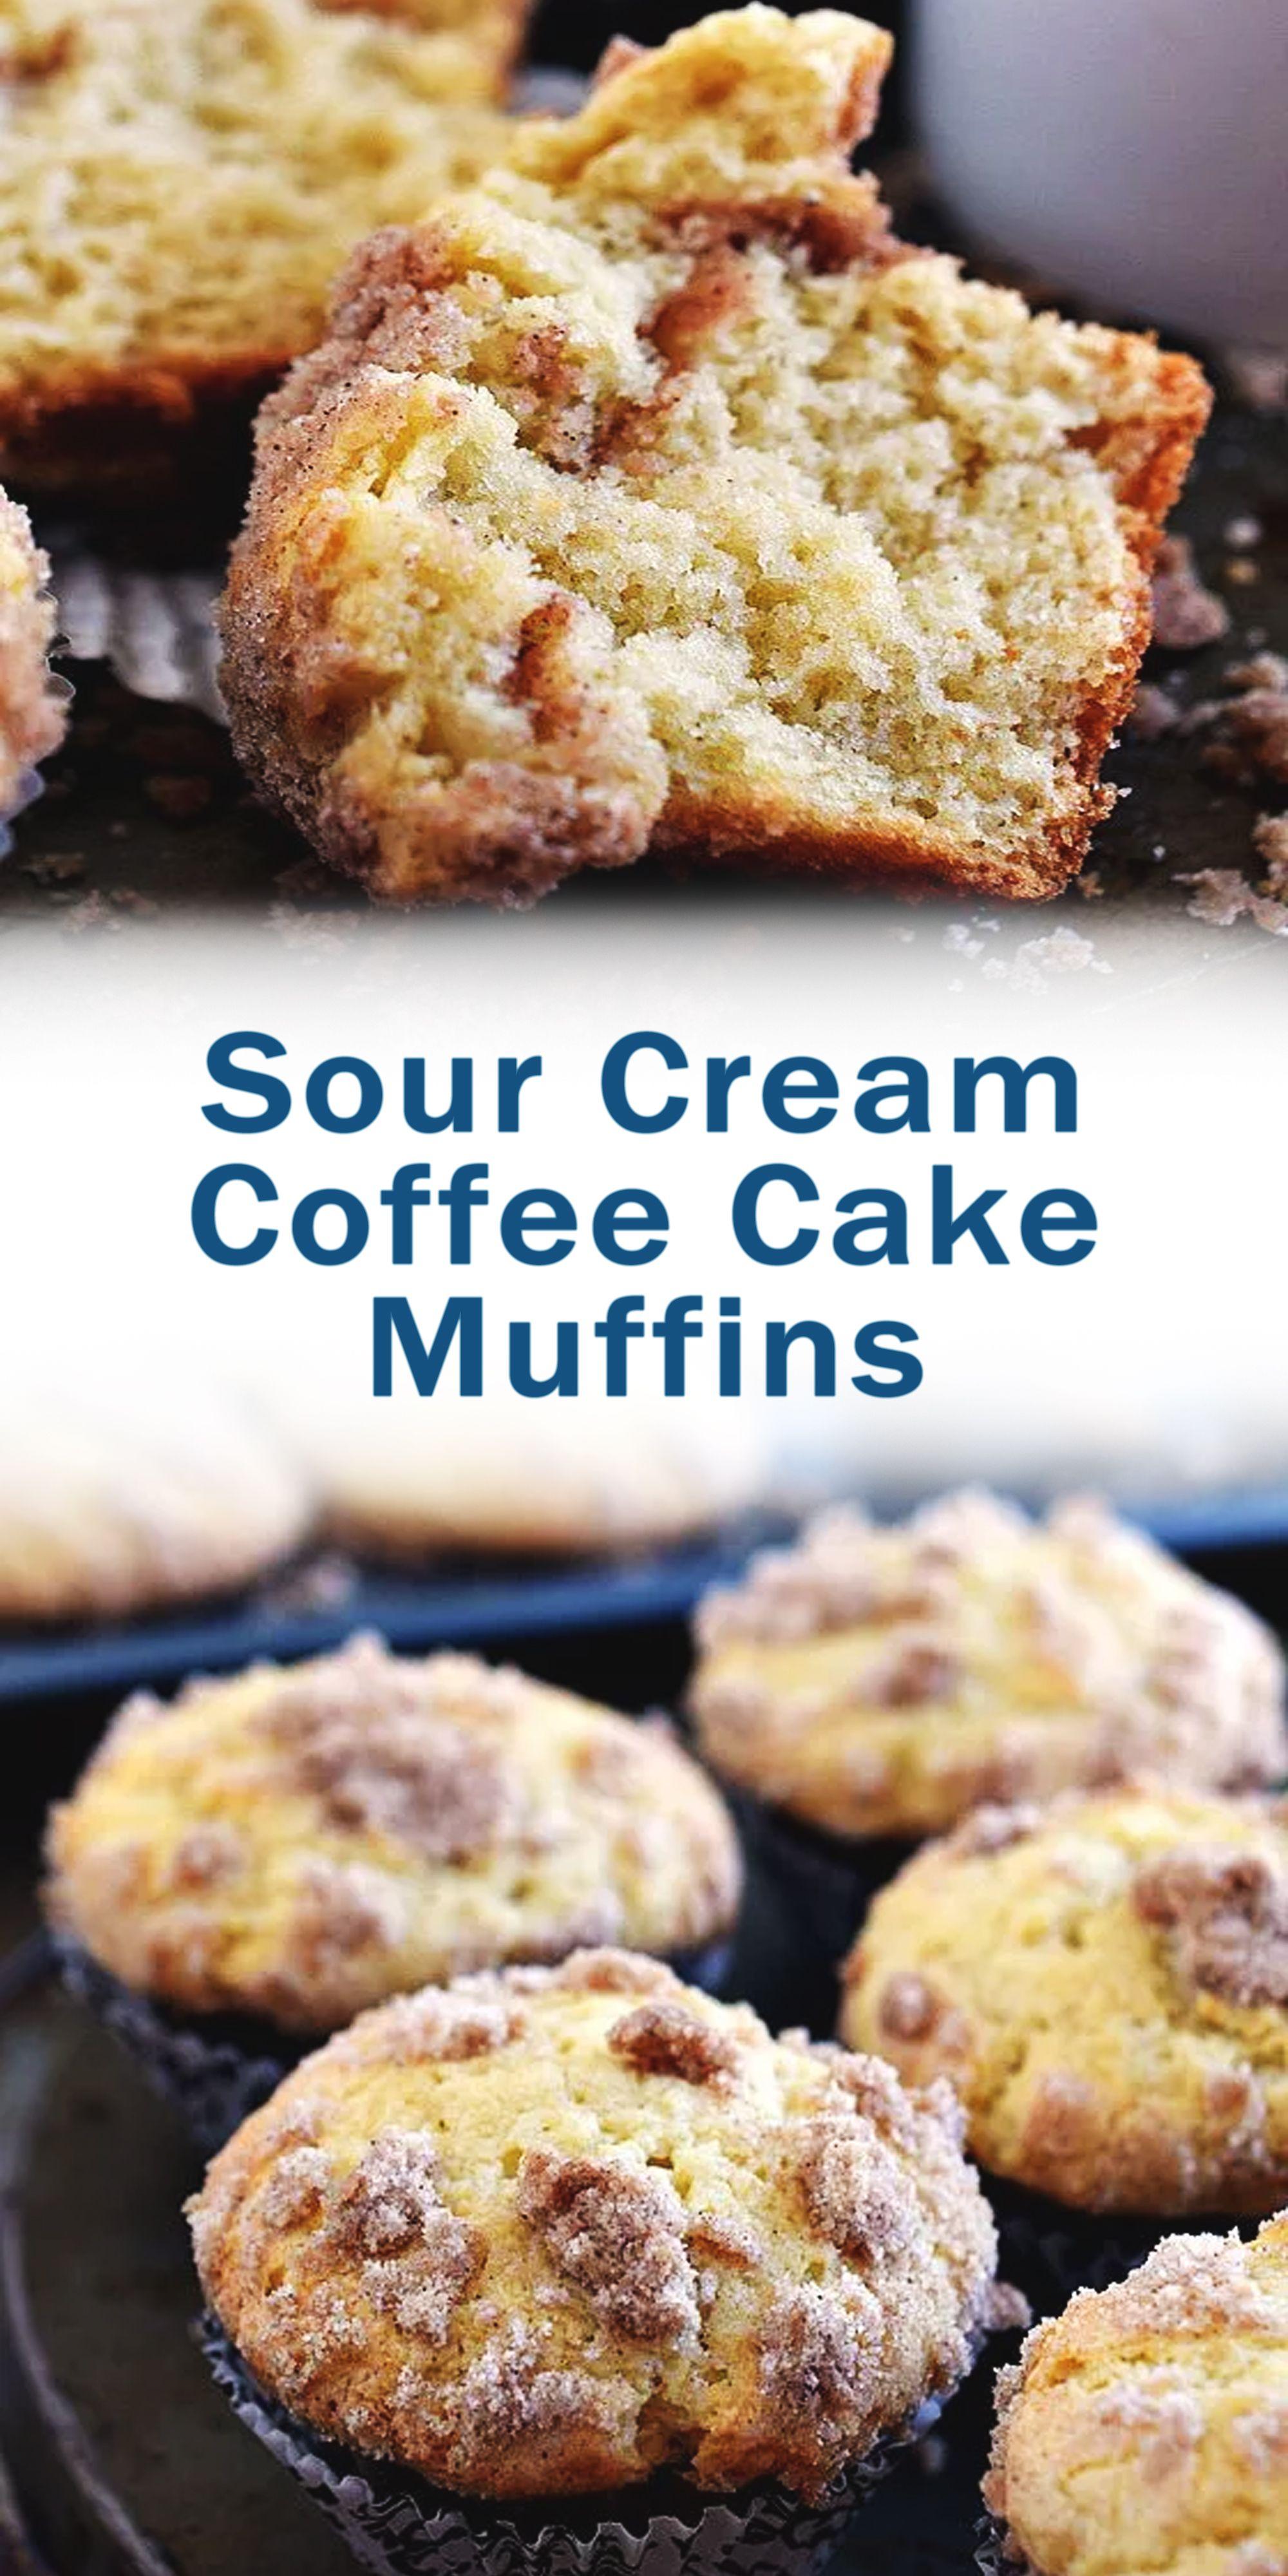 Sour Cream Coffee Cake Muffins In 2020 Dessert Recipes Coffee Cake Sour Cream Coffee Cake Muffins